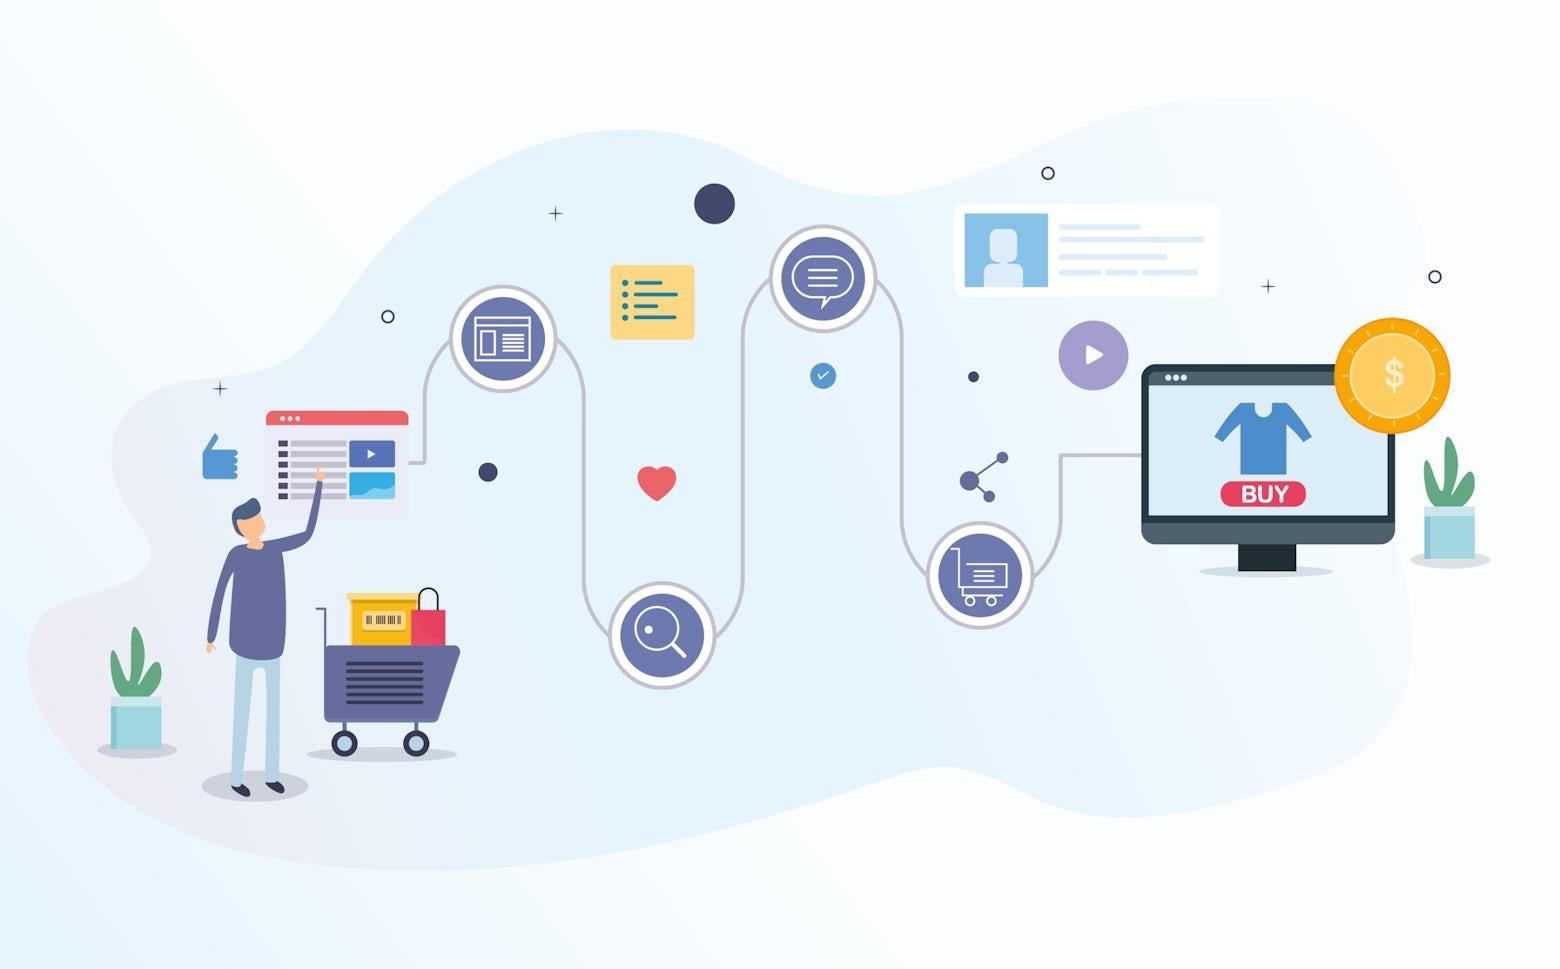 Marketing automation via Customer Journey